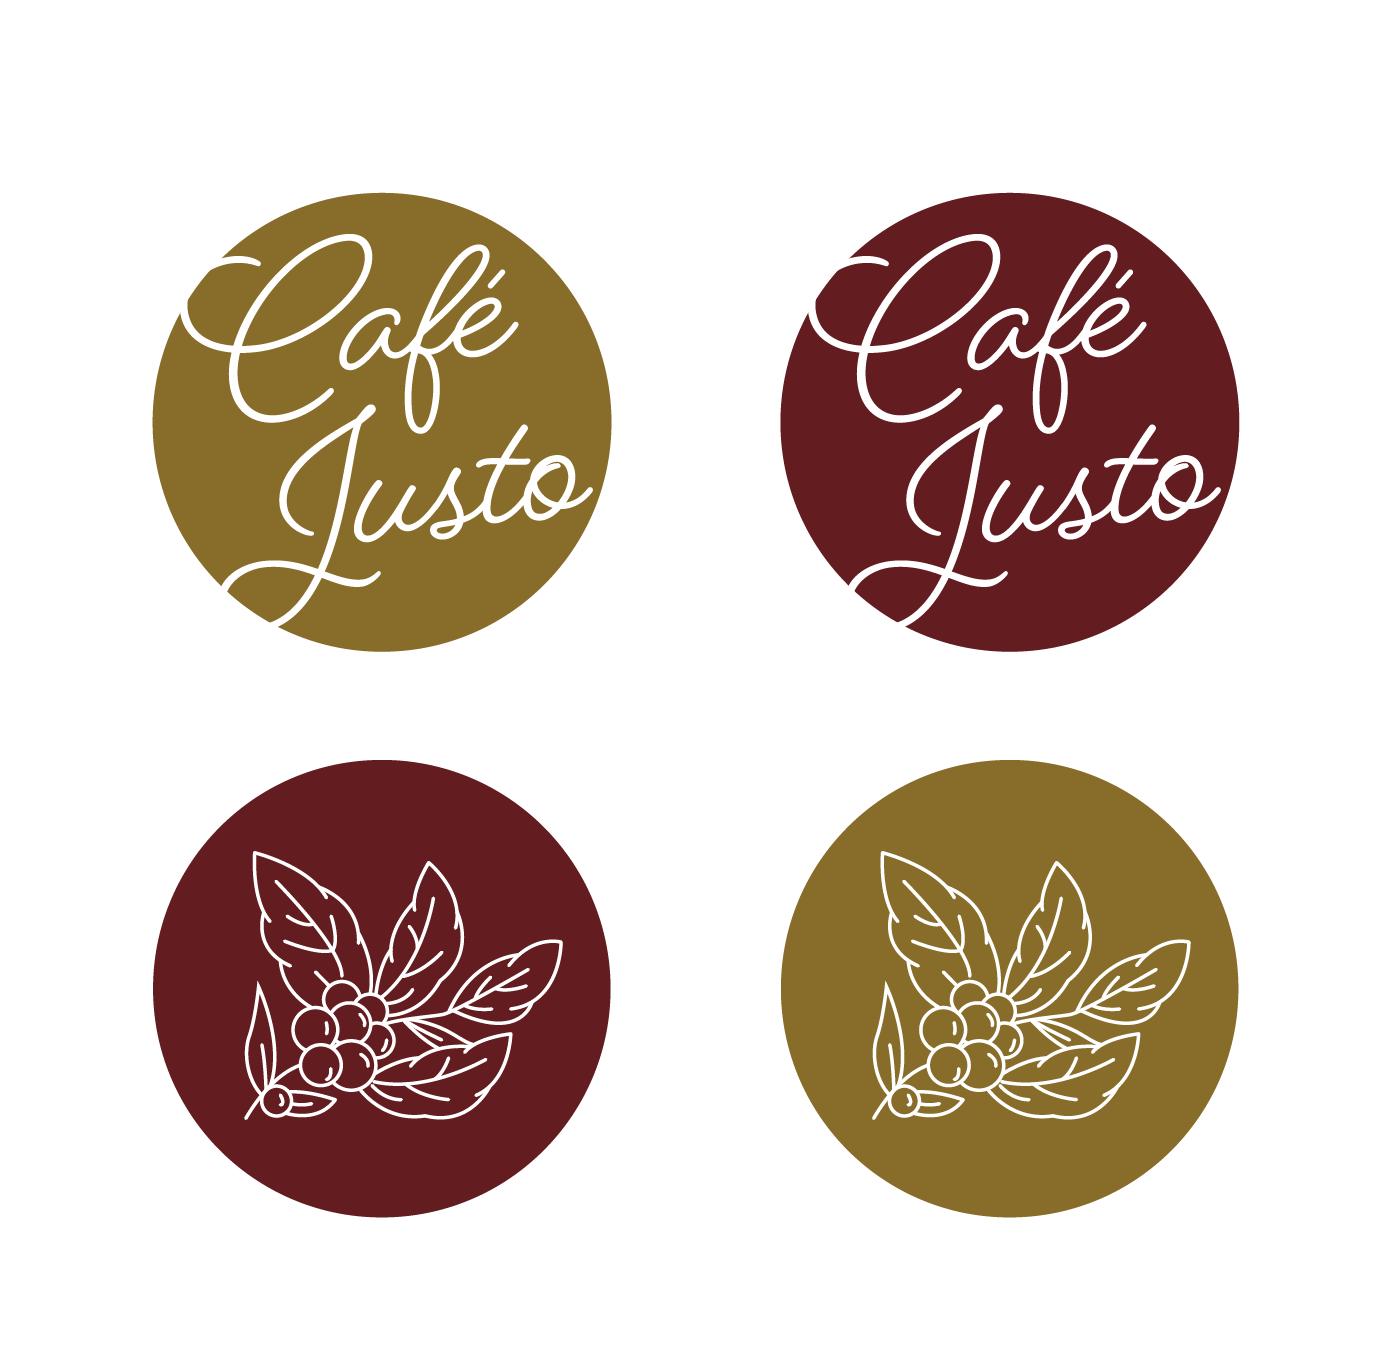 Cafe Justo logo elements_Artboard 10.png